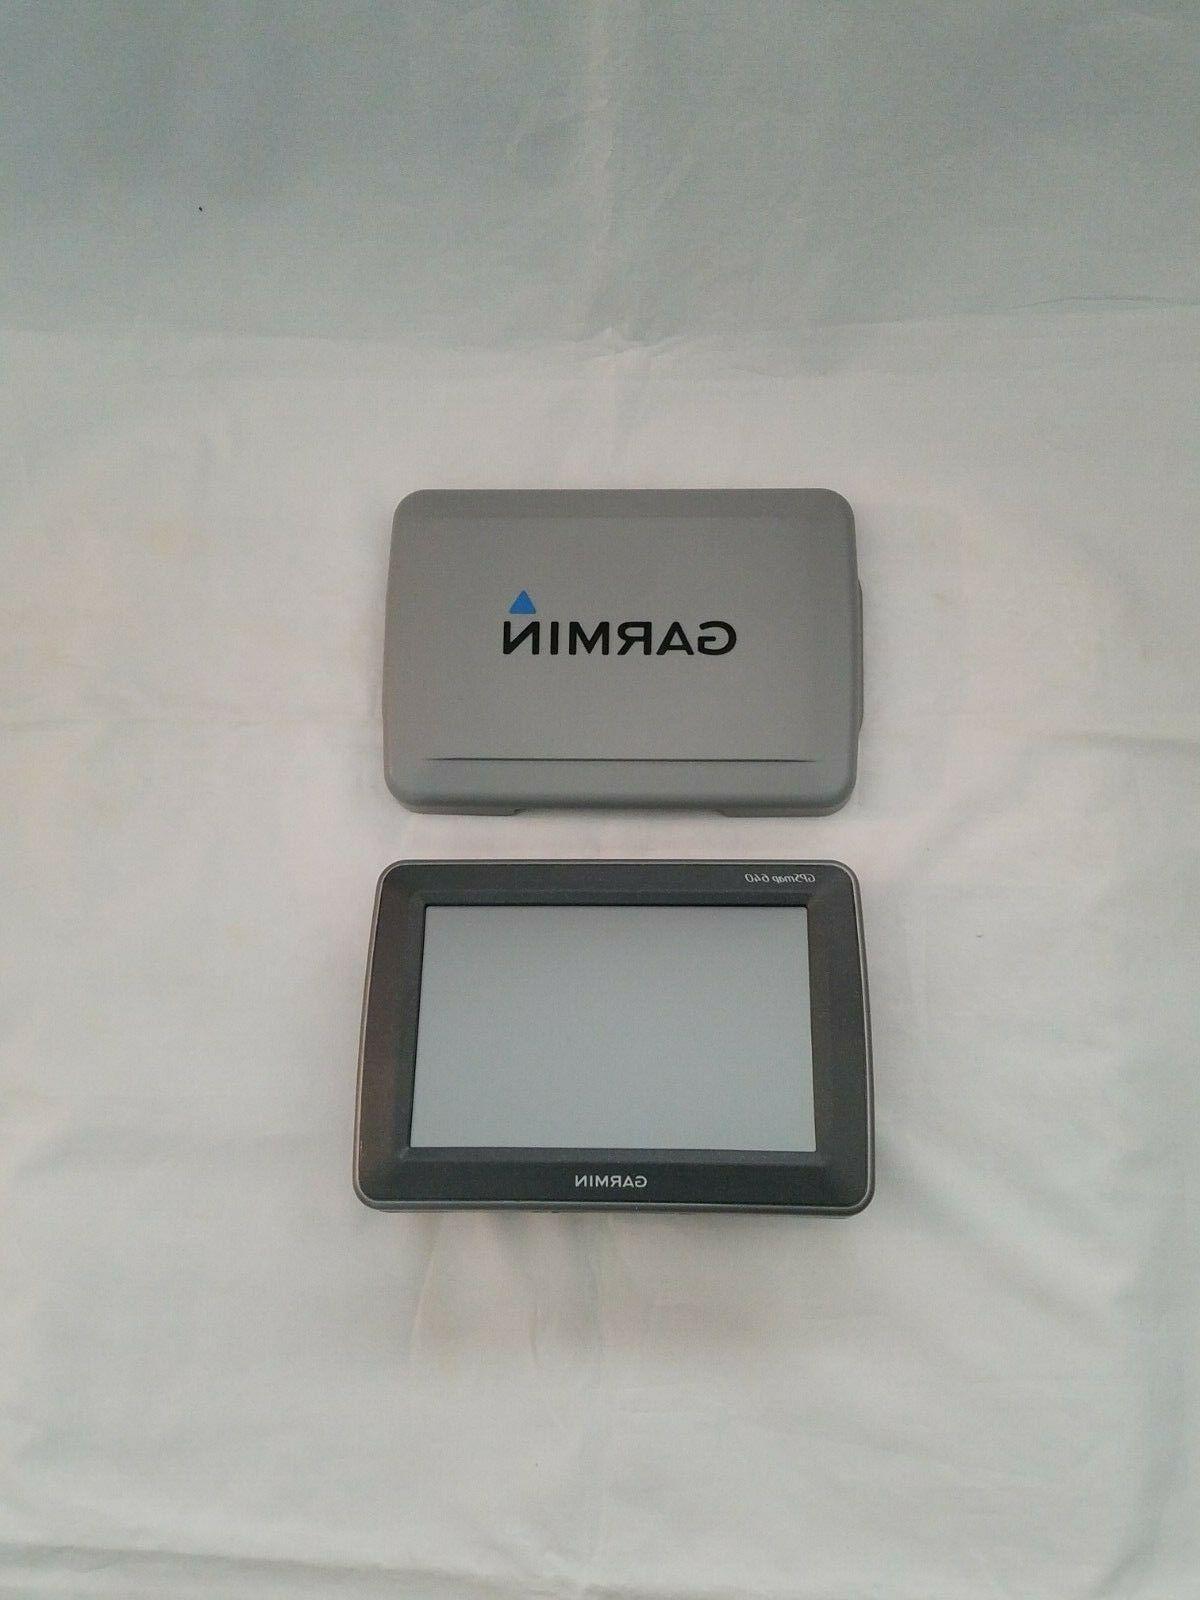 Garmin GPSMAP 640 Marine and Touchscreen